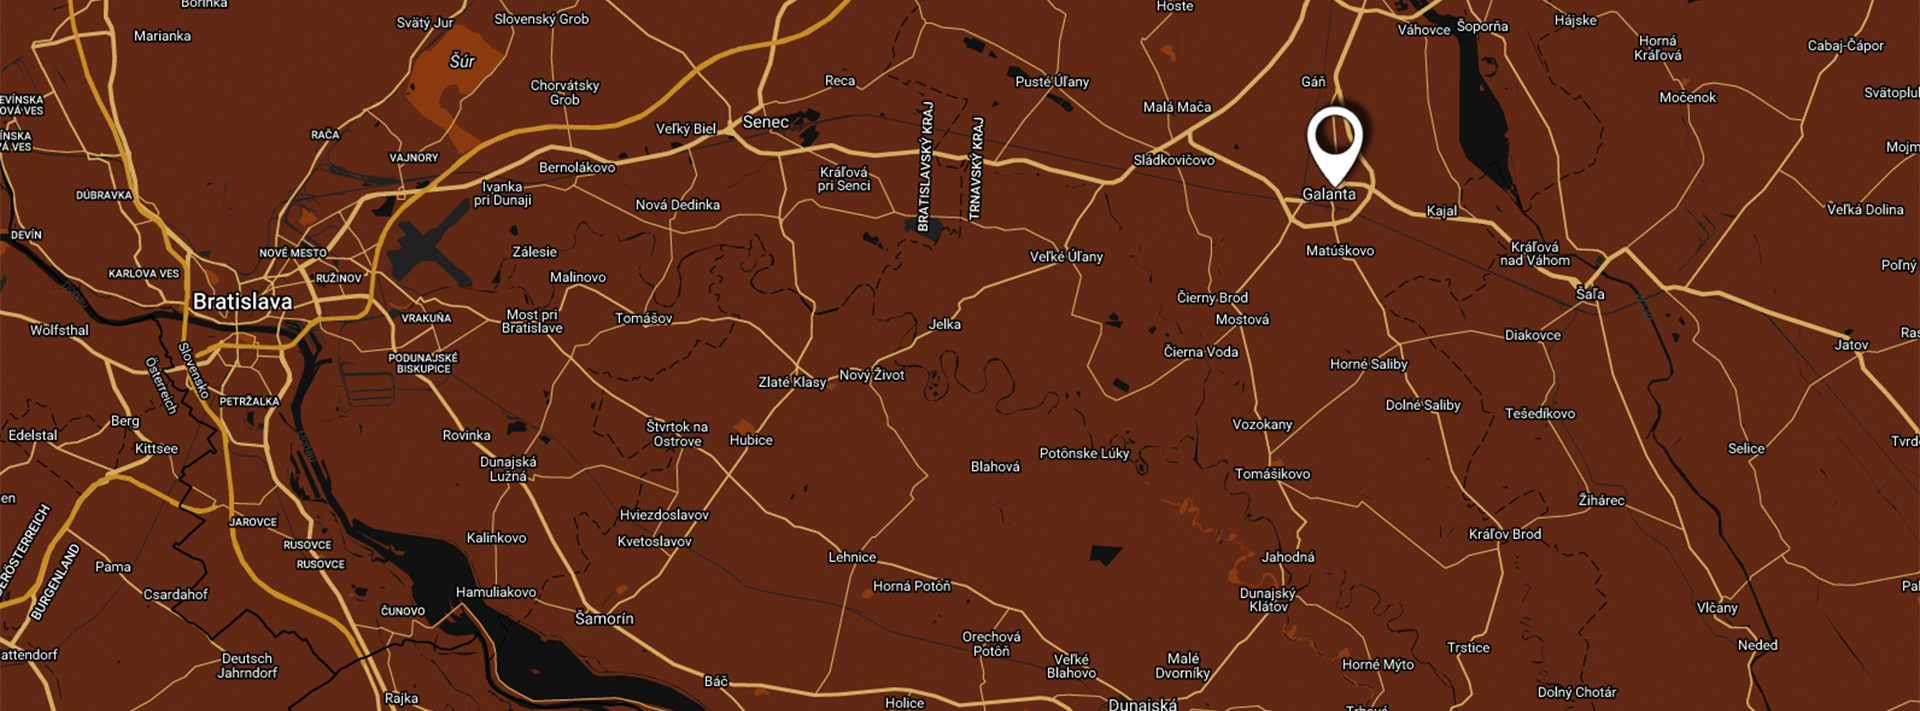 Kunstschmiede Szlavik Map Kontakt